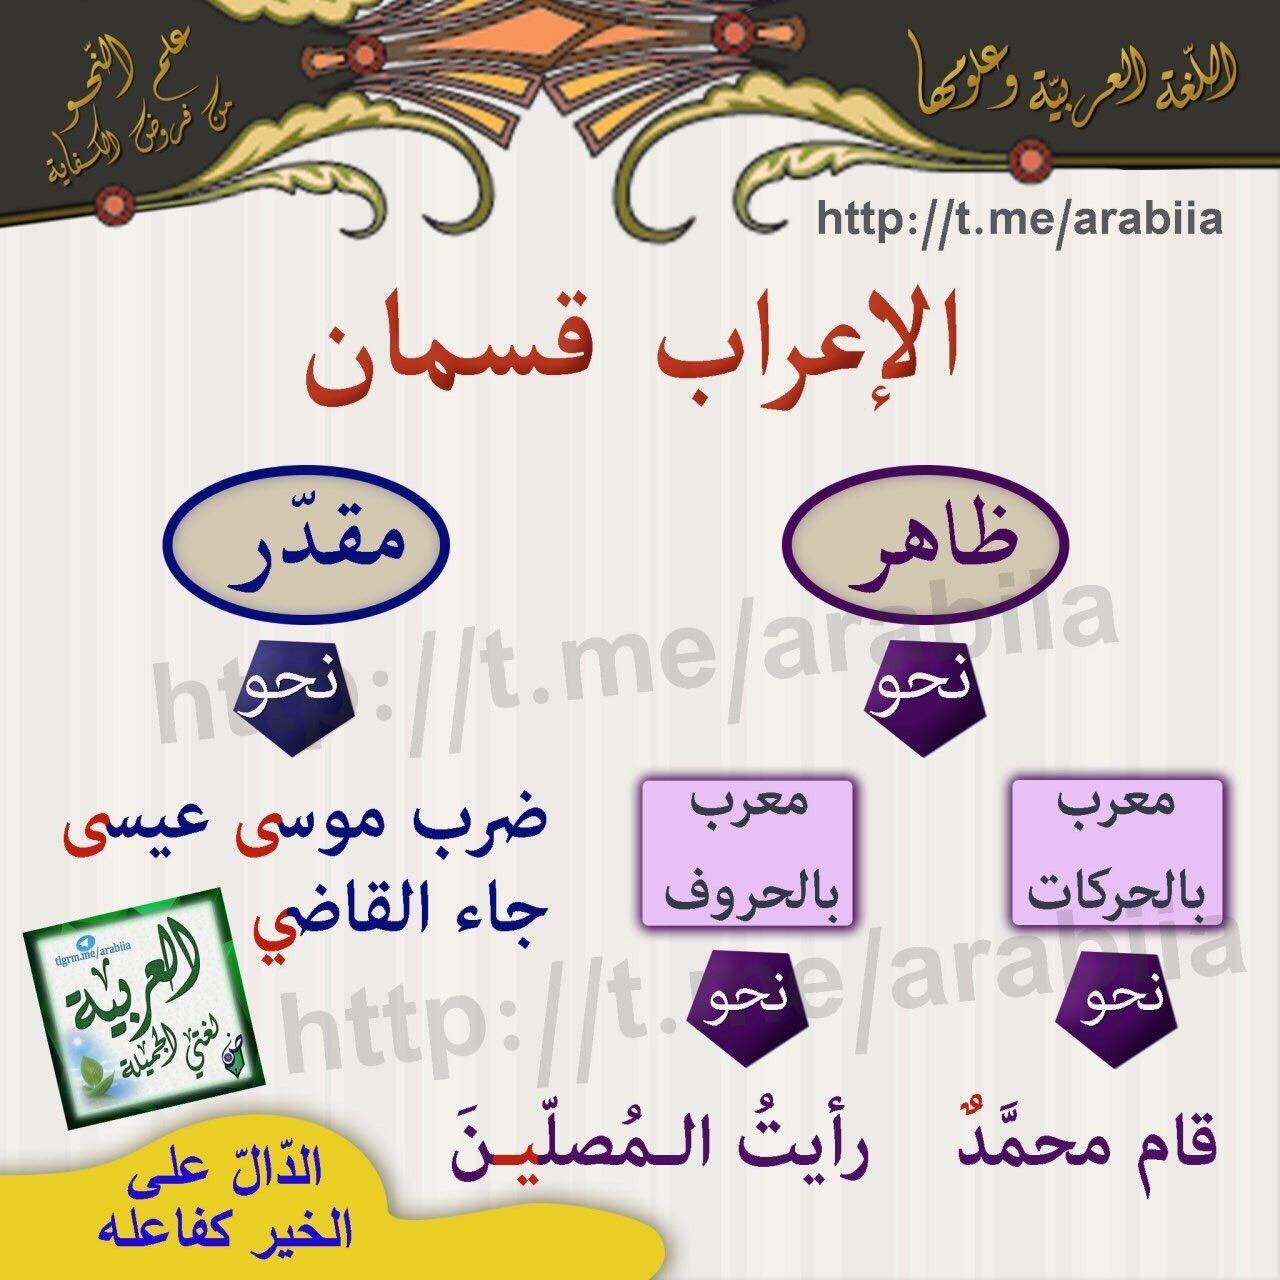 Pin By Soso On فوائد نحوي ة Arabic Language Arabic Lessons Learning Arabic